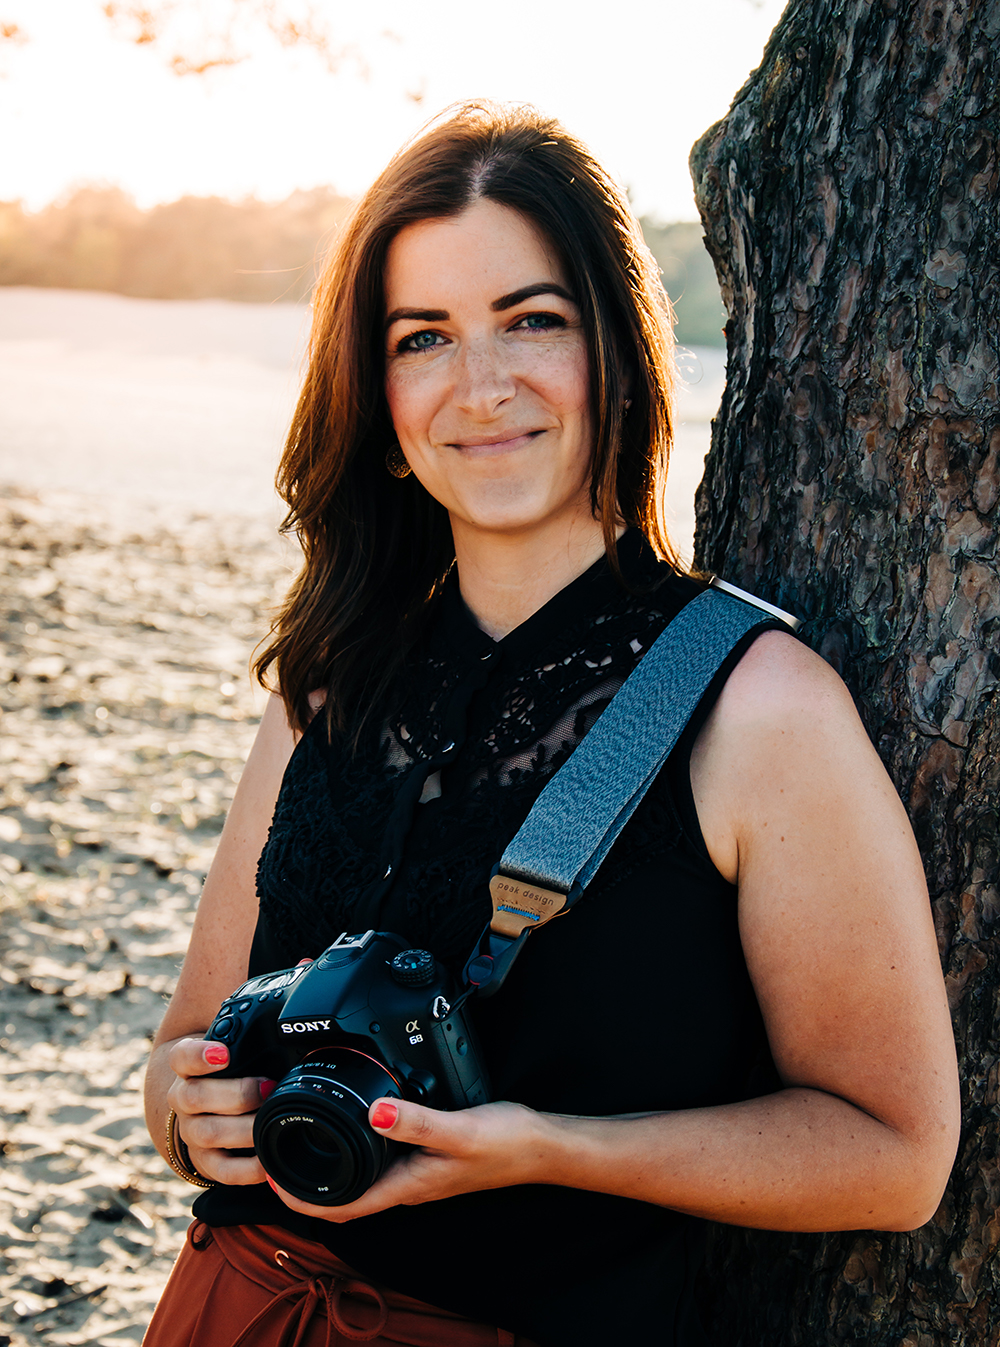 DVO fotografie - Denise van Oers - Lachende vrouw met camera